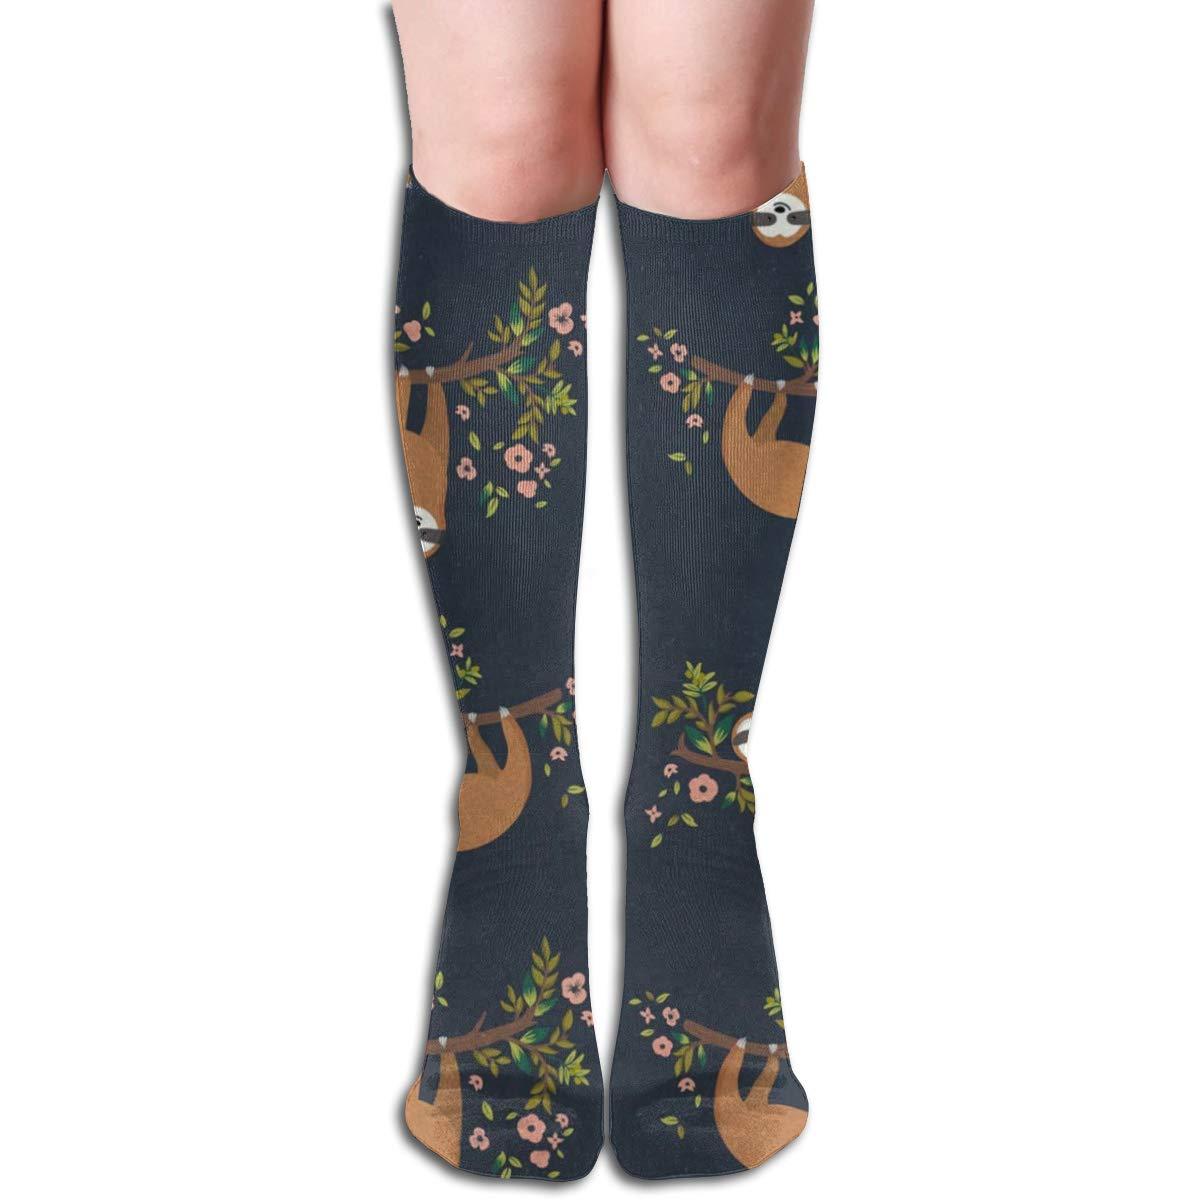 Girls Socks Over Knee Baby Sloth Flowers Winter Warmth Marvellous For Easter